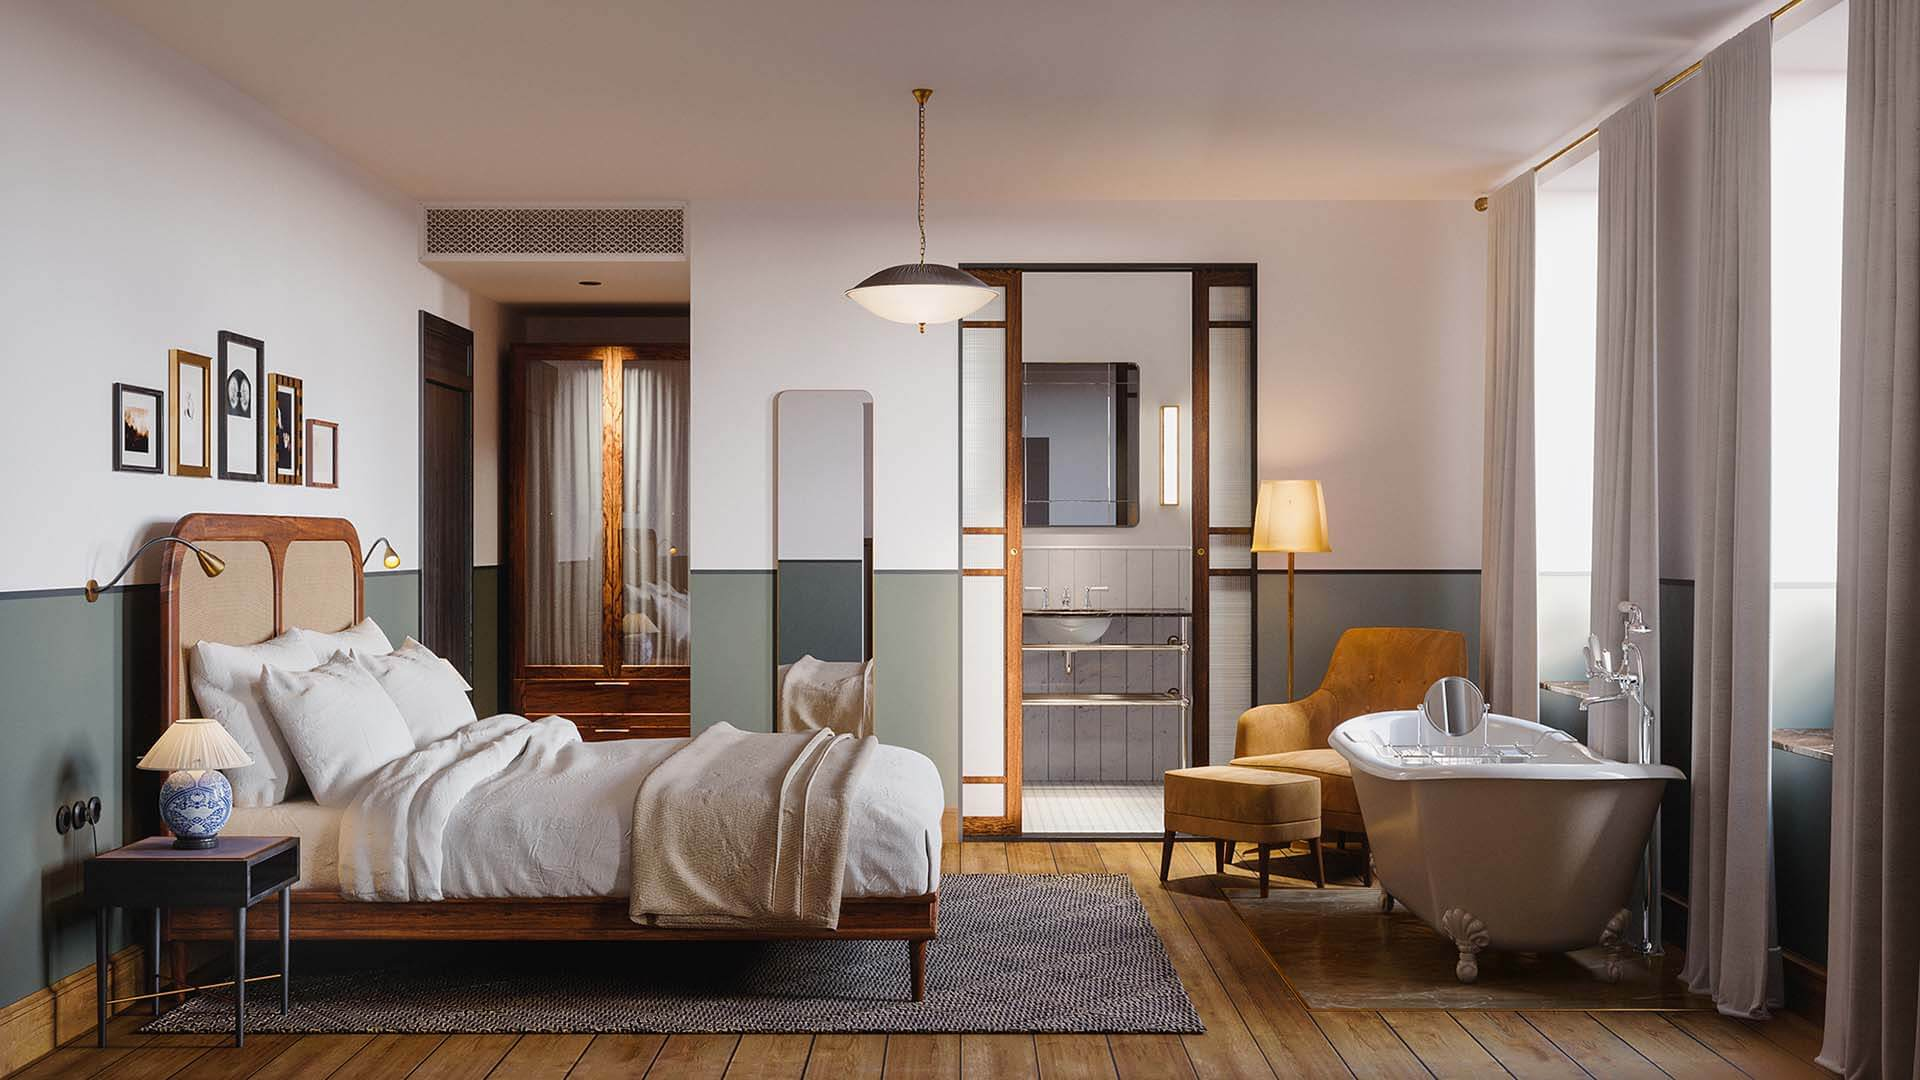 3D-Vizual | 3D Visualisering | HOTEL & RESTAURANT 1.1 - SANDERS HOTEL